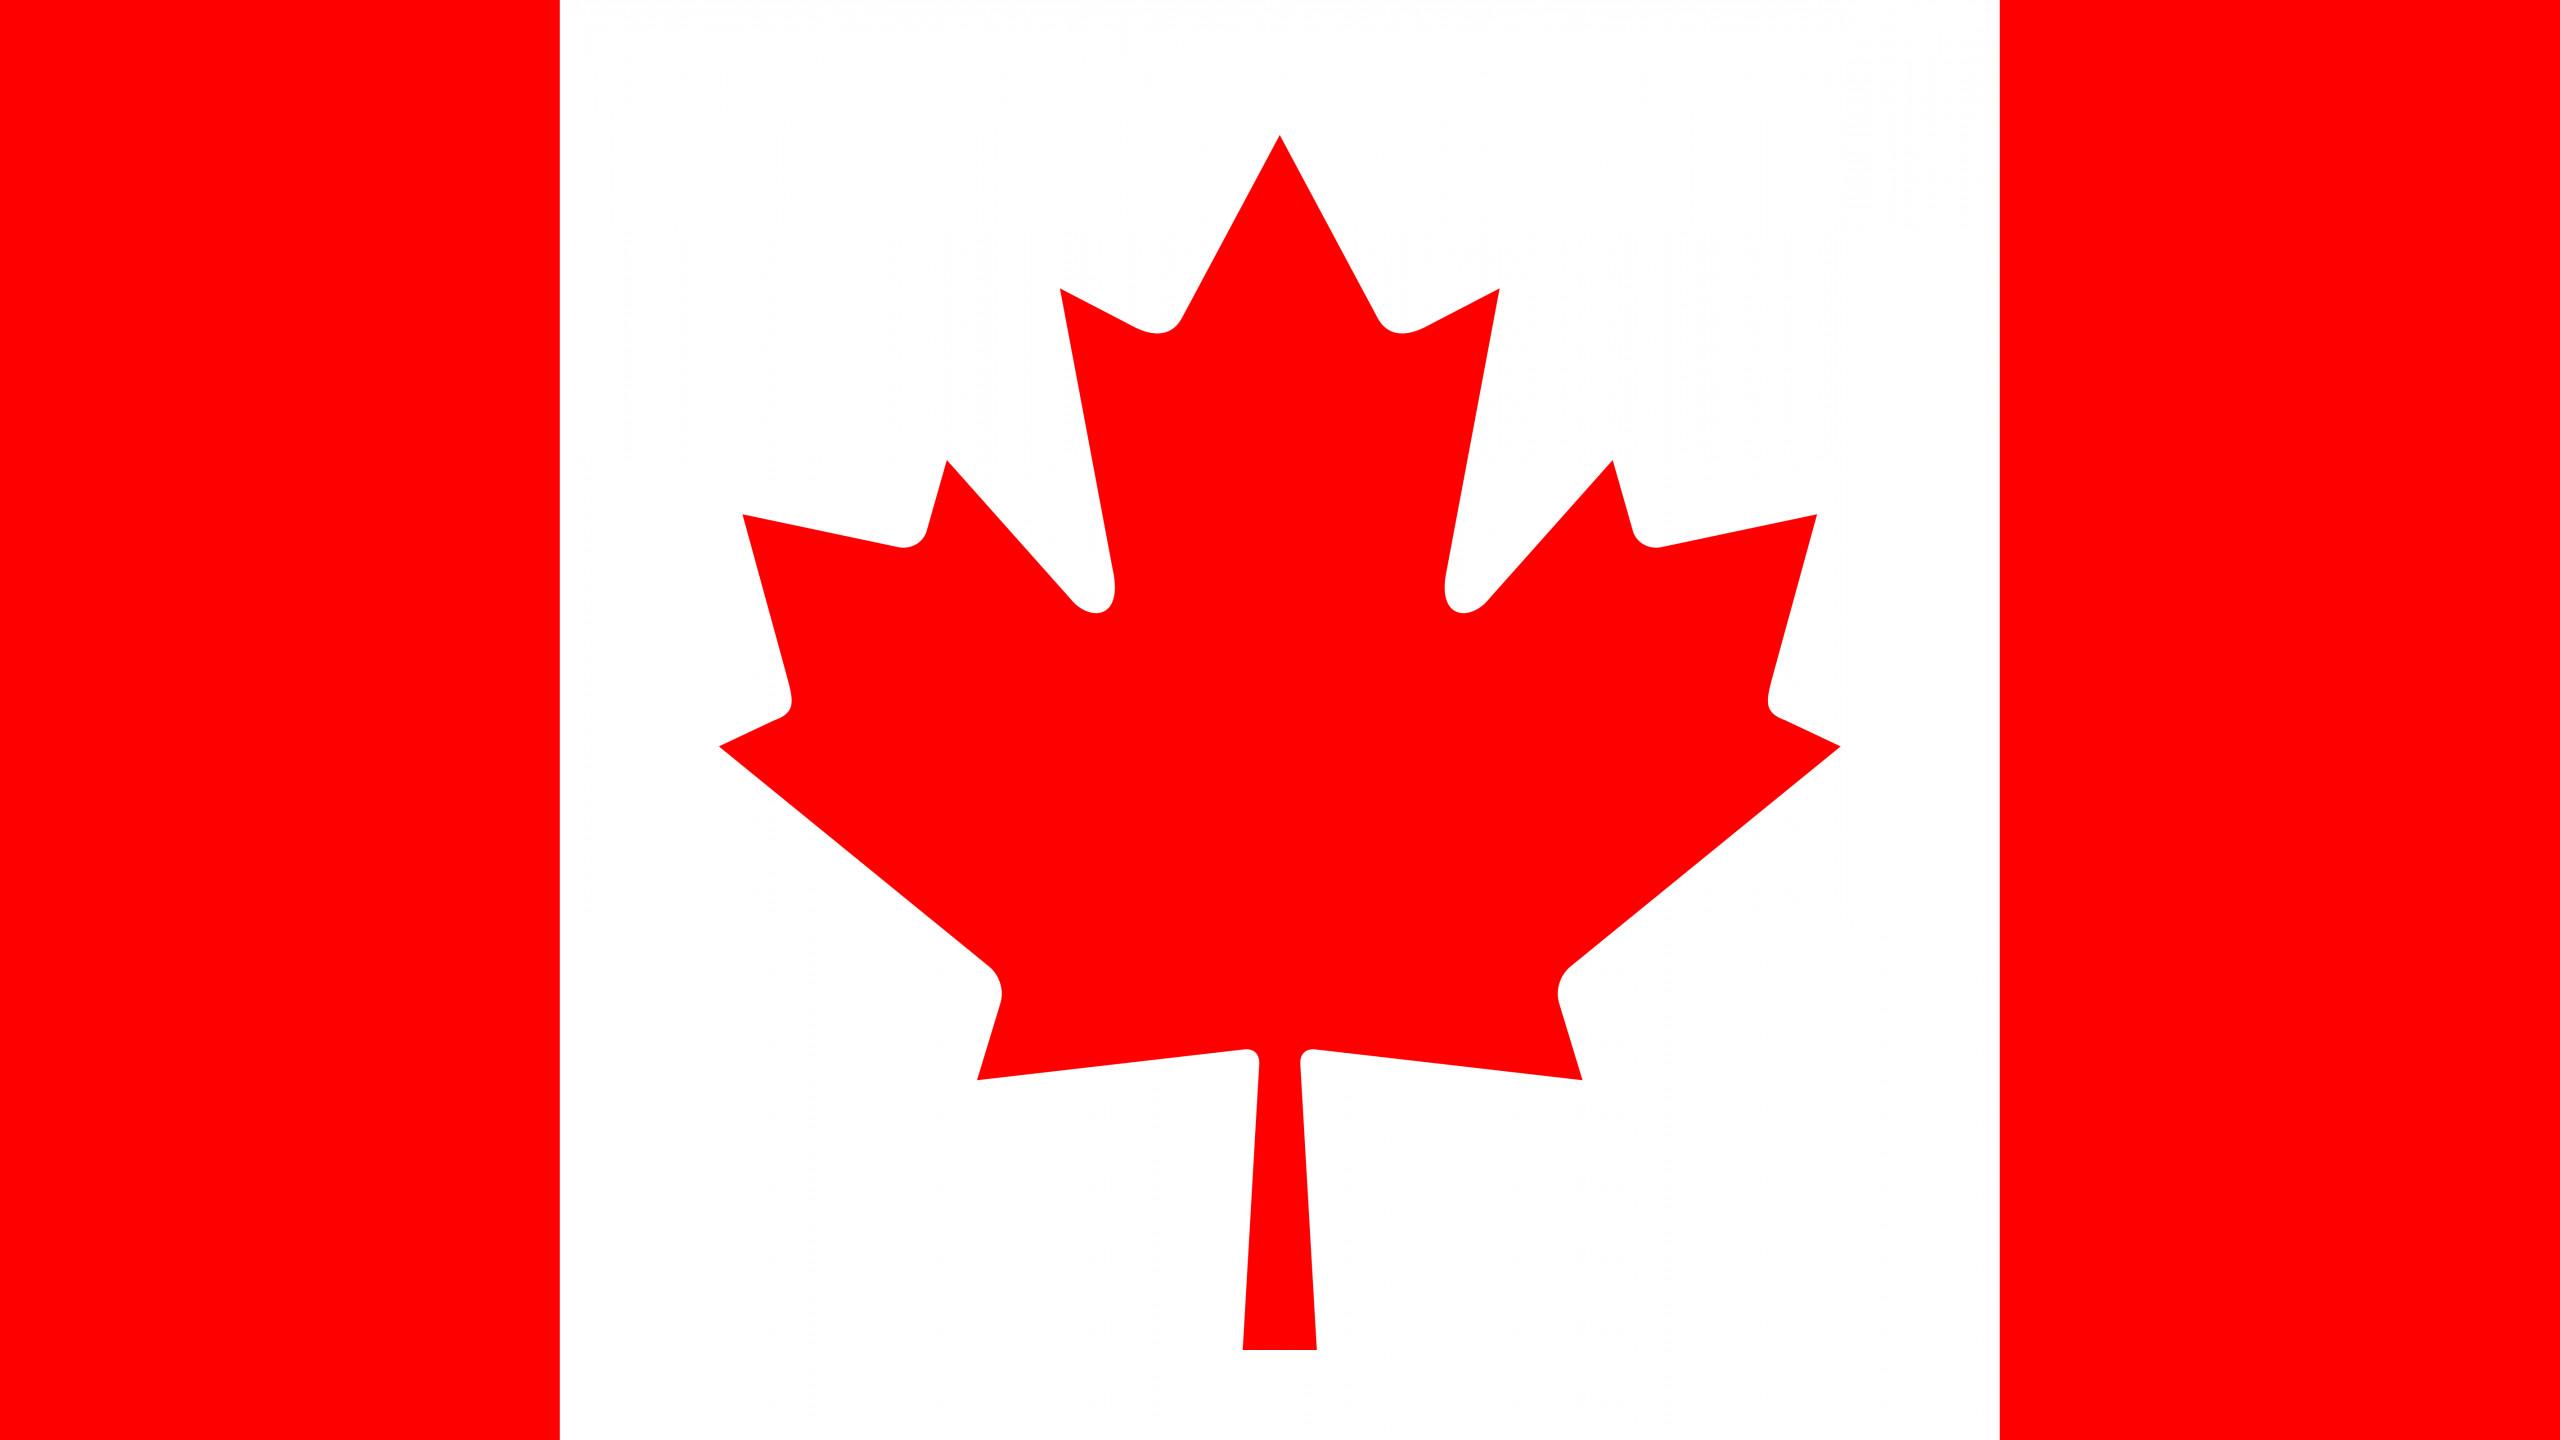 World / Flag of Canada Wallpaper